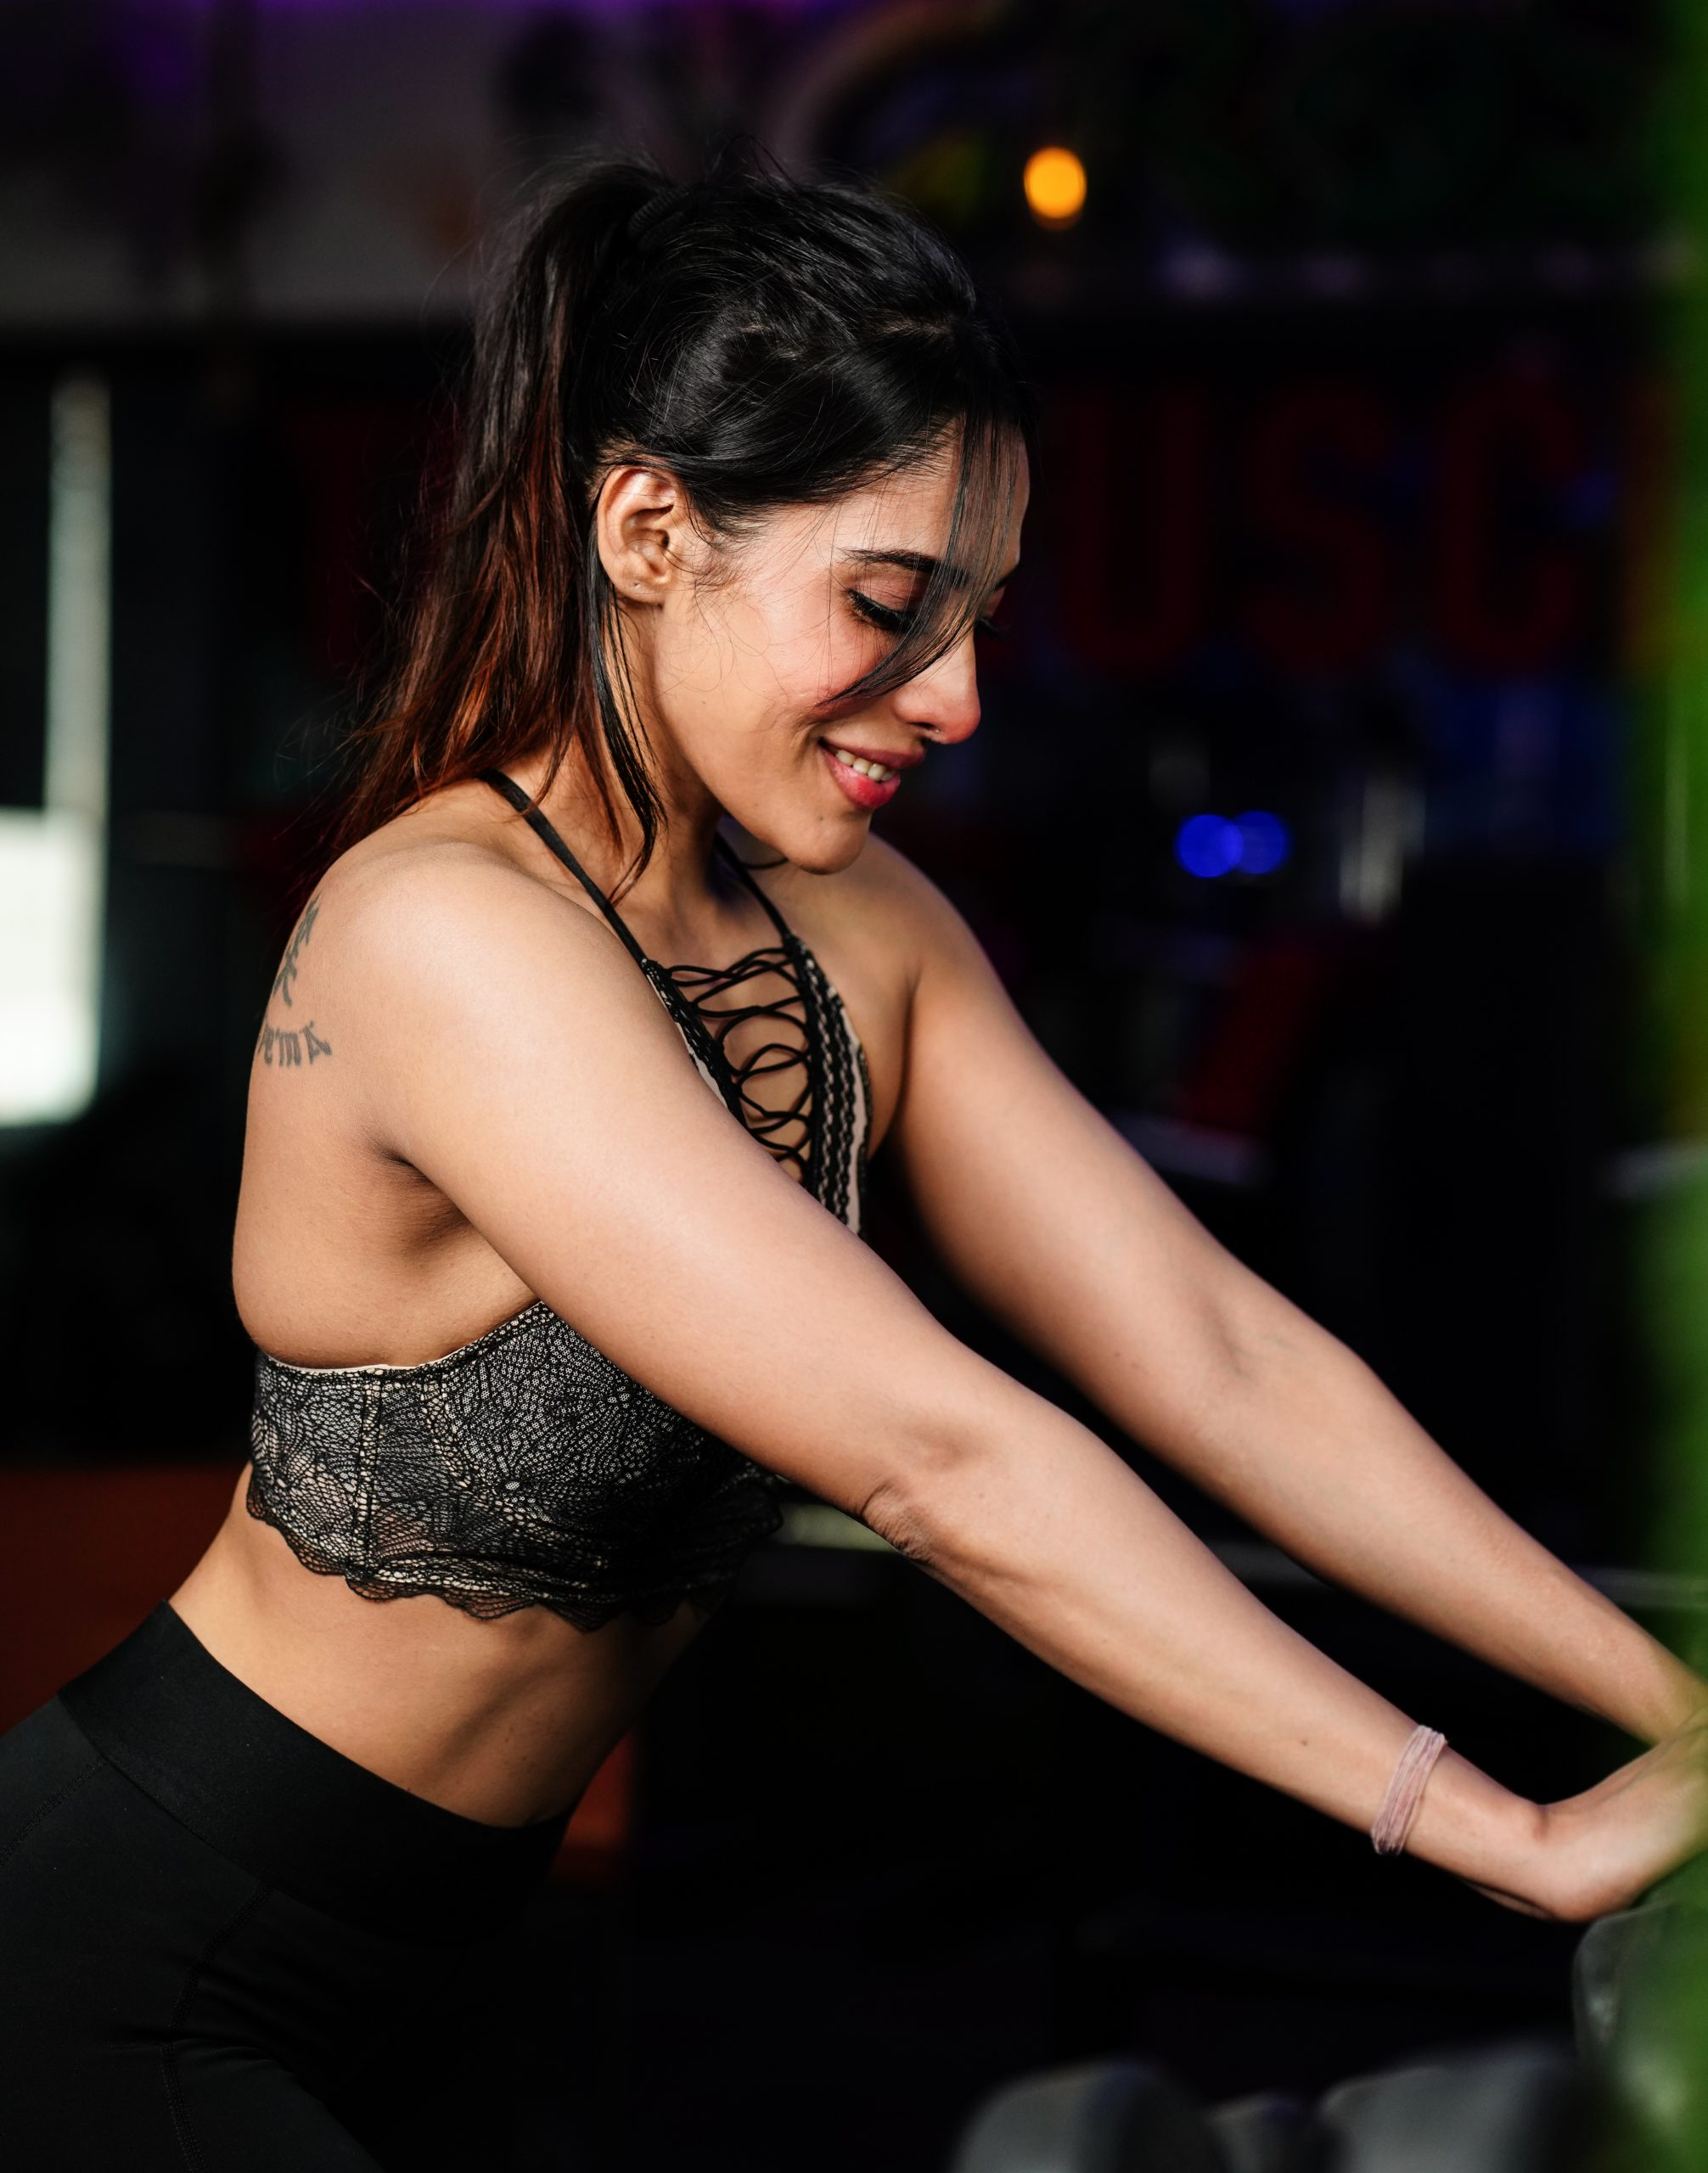 Female gym goer smiling